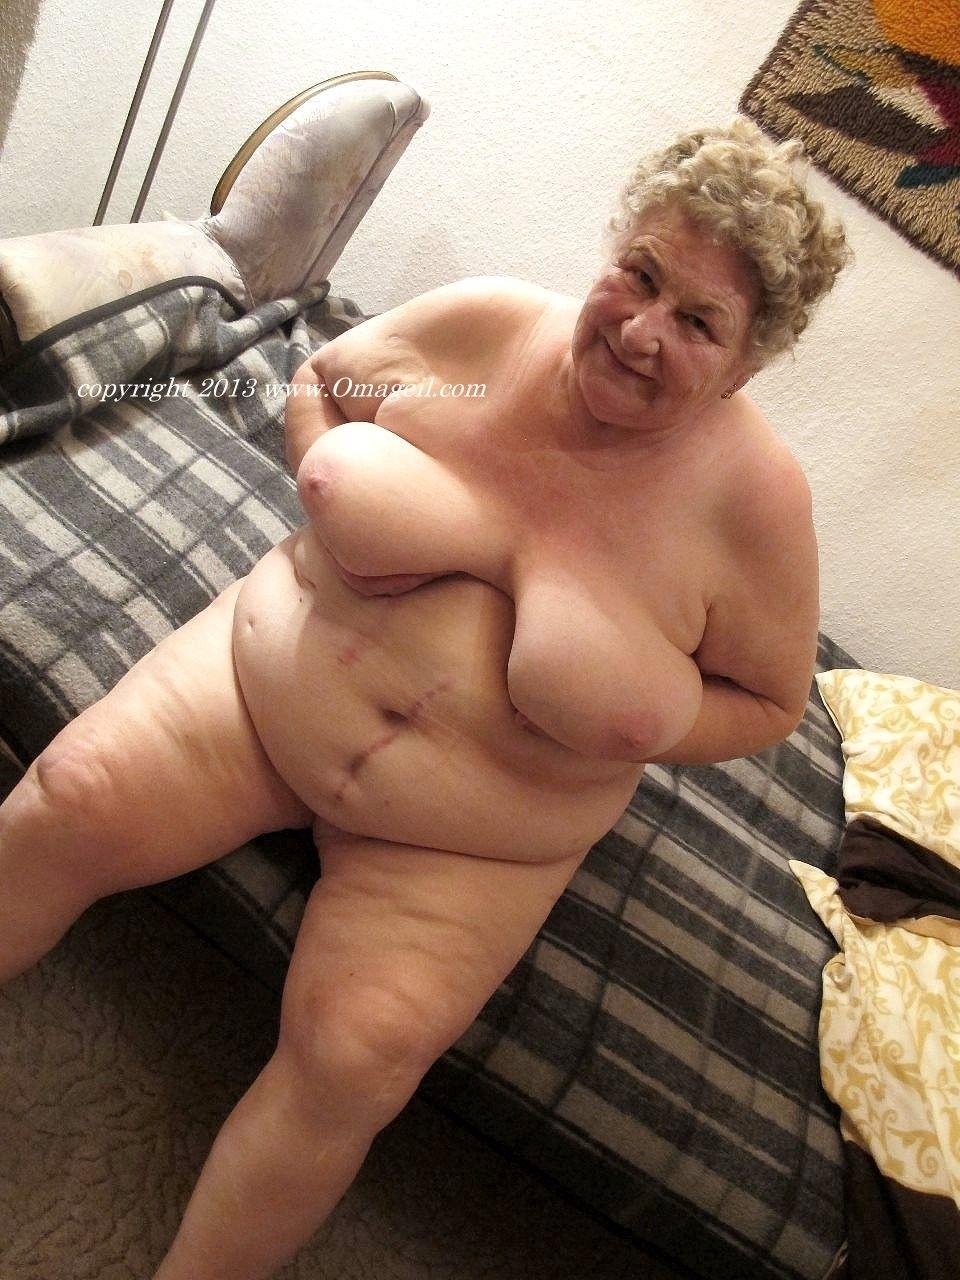 Busty mature women naked ready help